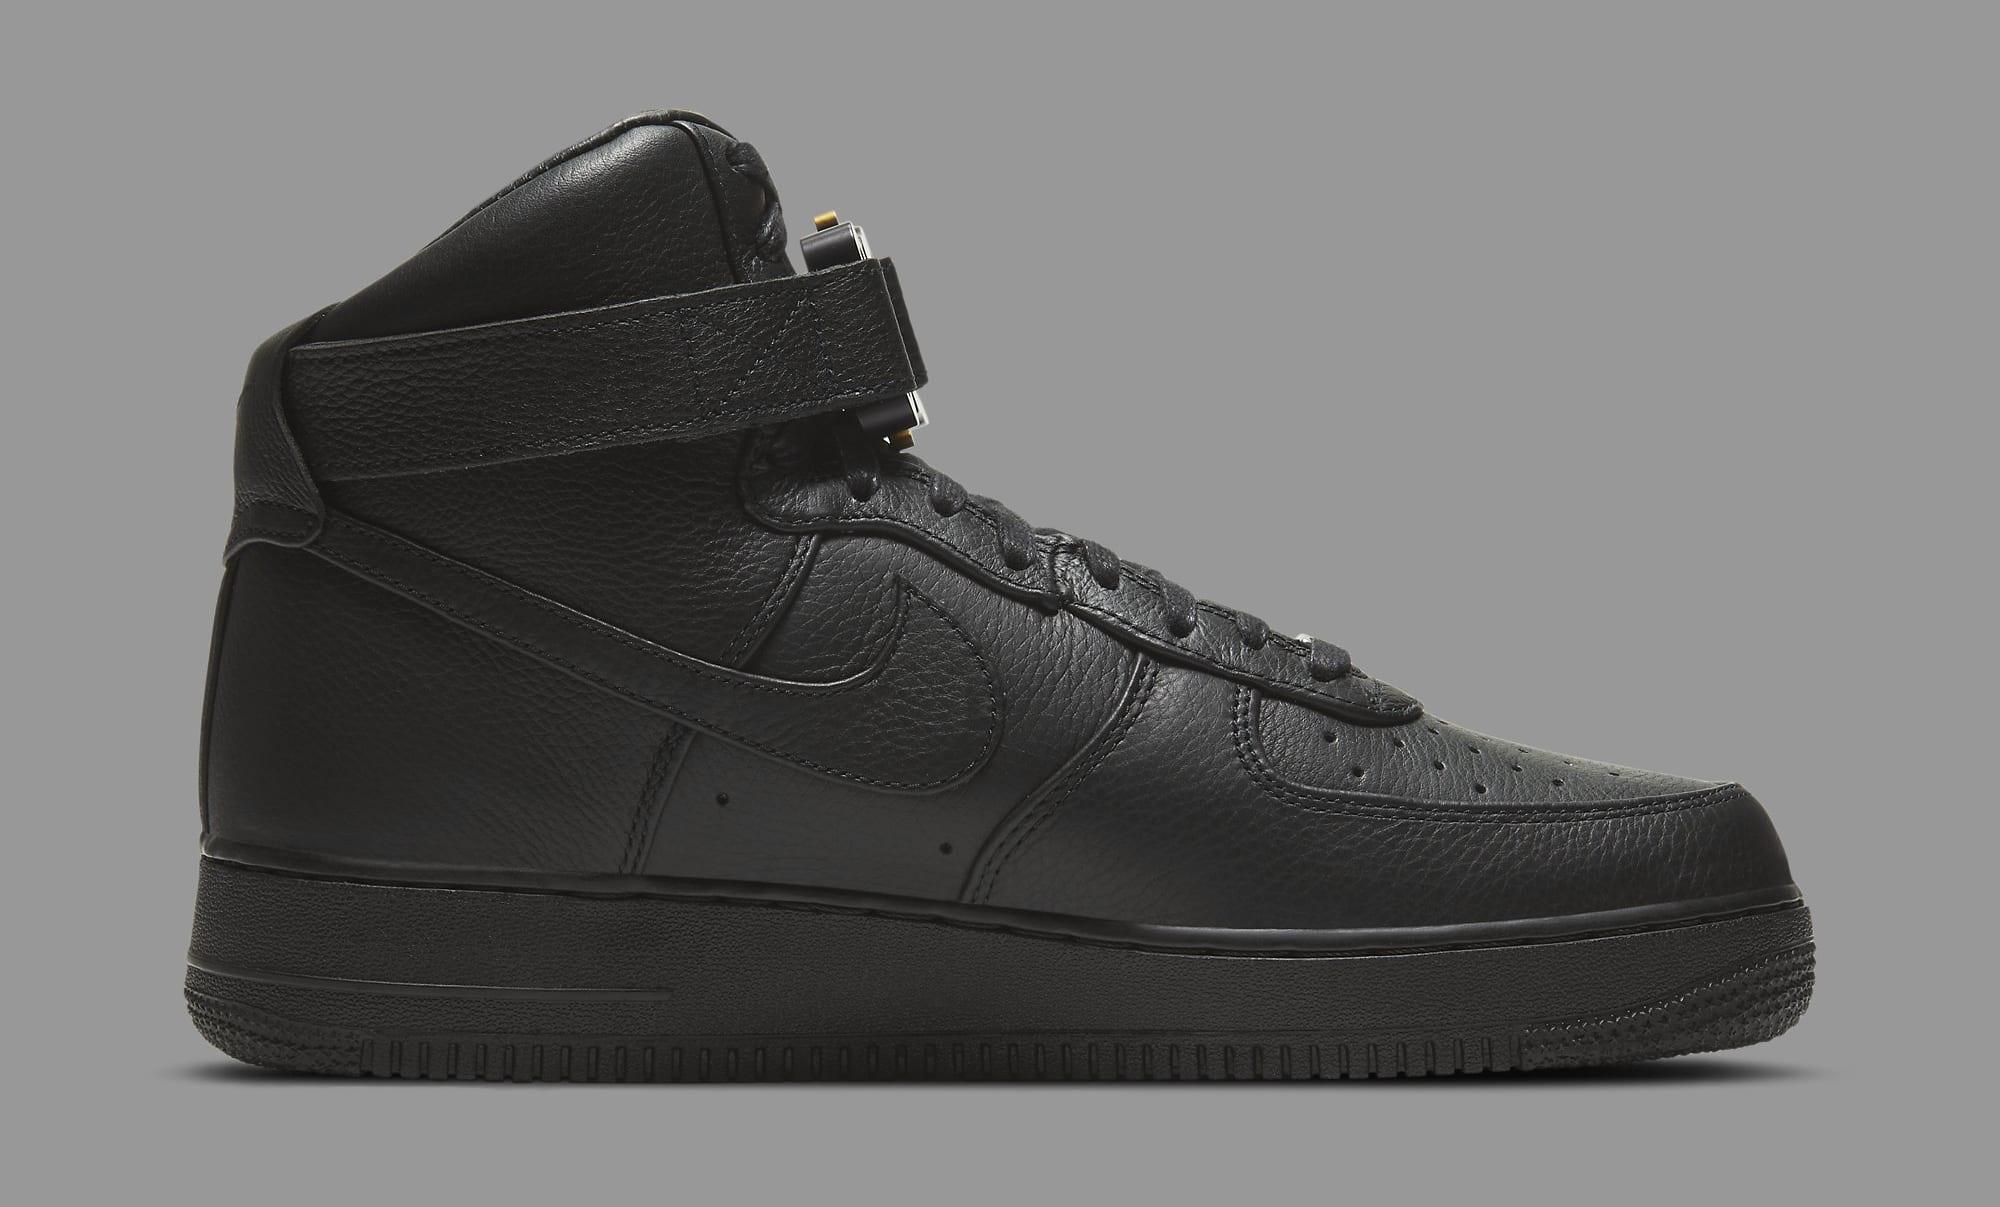 Alyx x Nike Air Force 1 High CQ4018-001 Medial